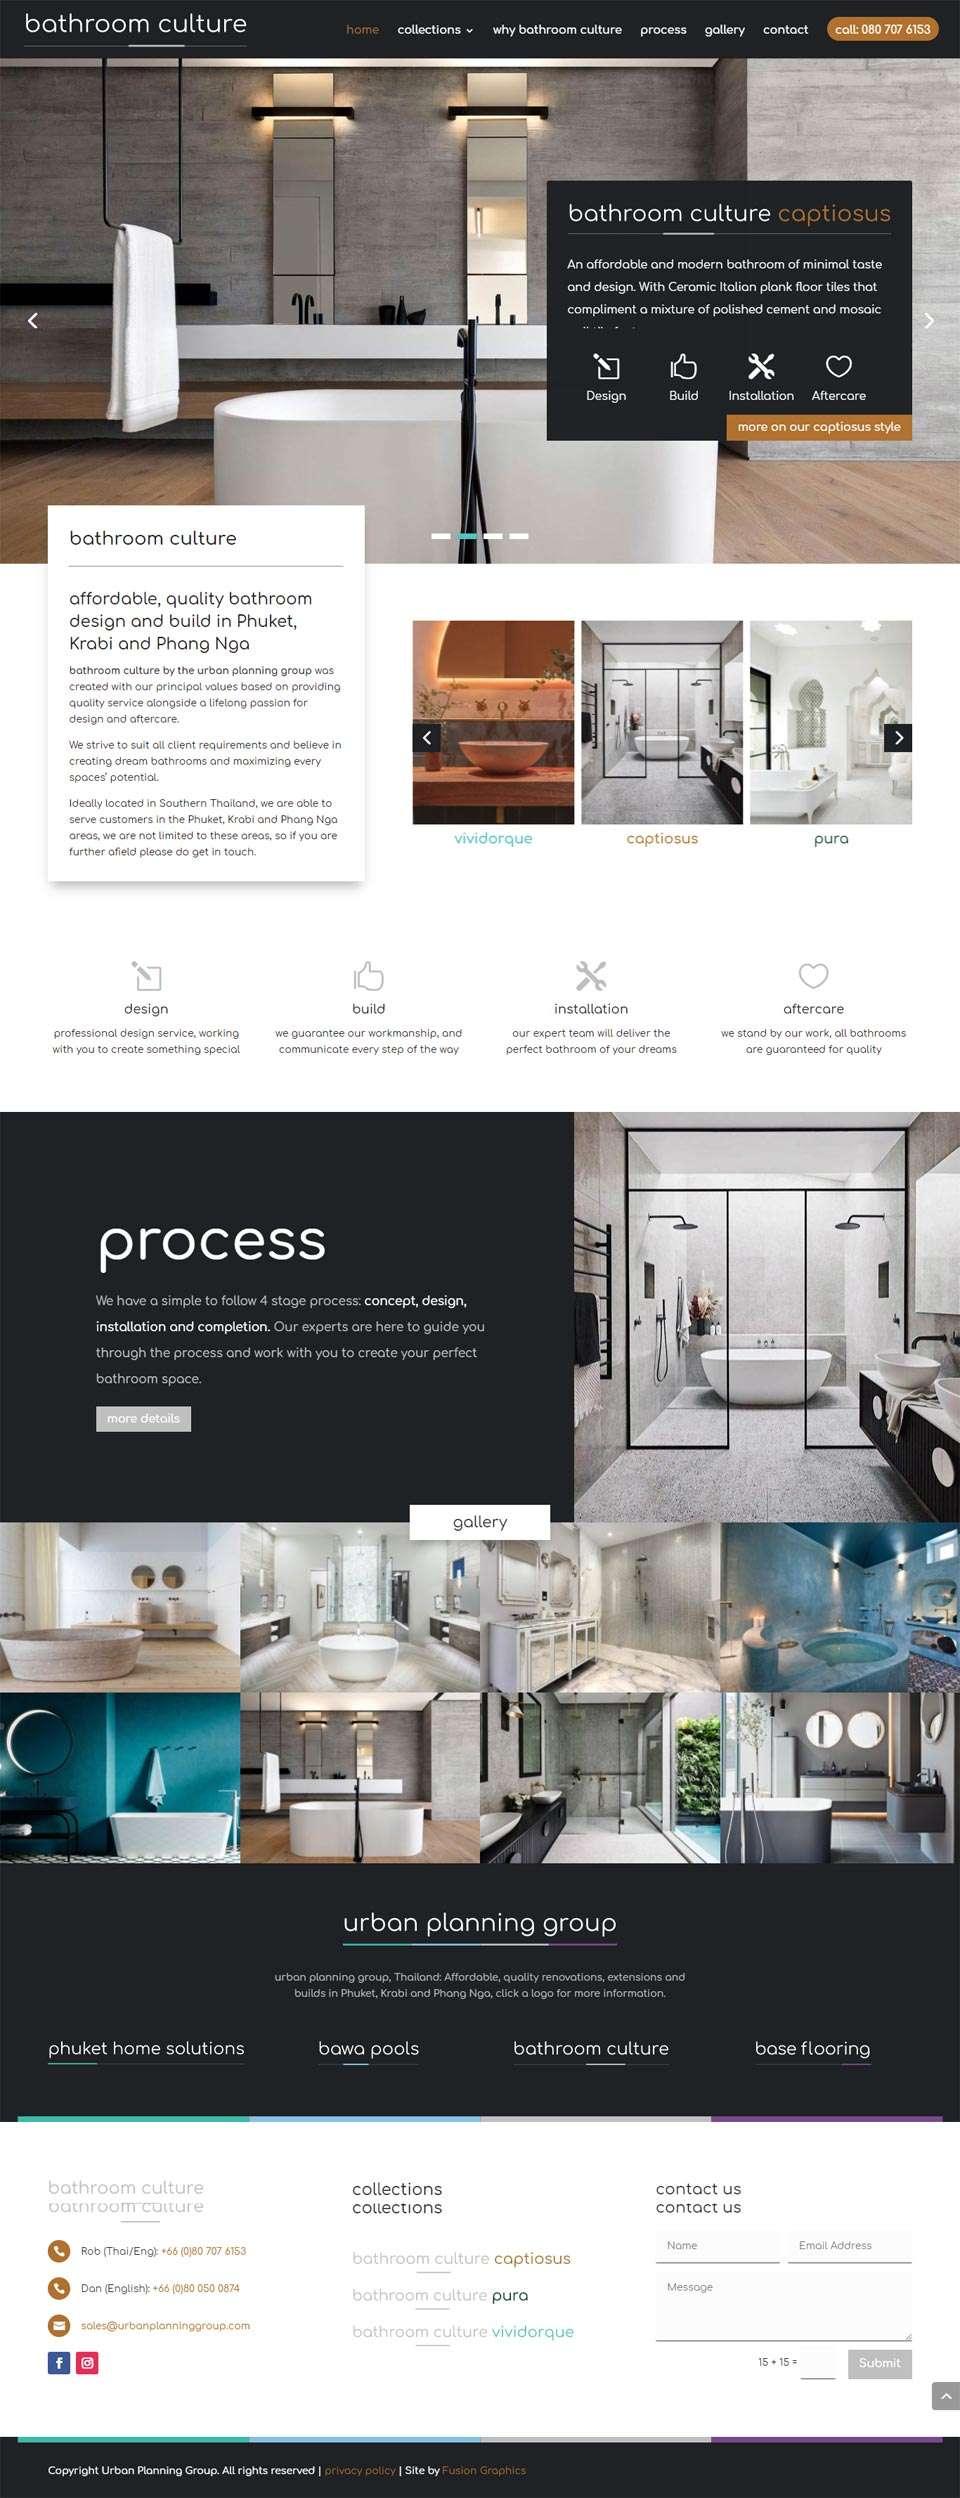 Urban Planning Group Phuket website image